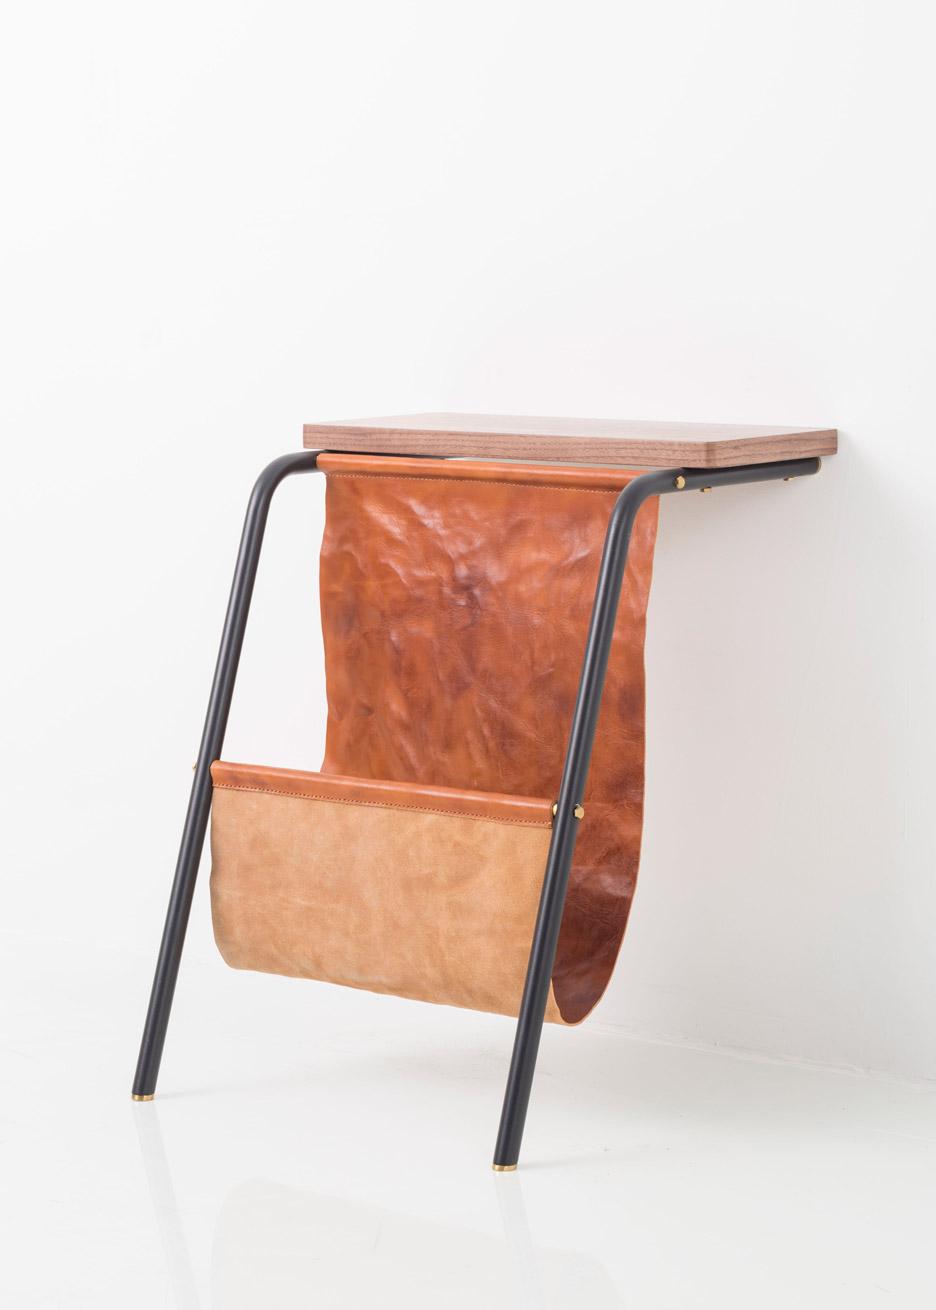 valet-collection-david-rockwell-group-stellar-works-furniture-milan-2016-product-design_dezeen_936_0_dezeen_936_9